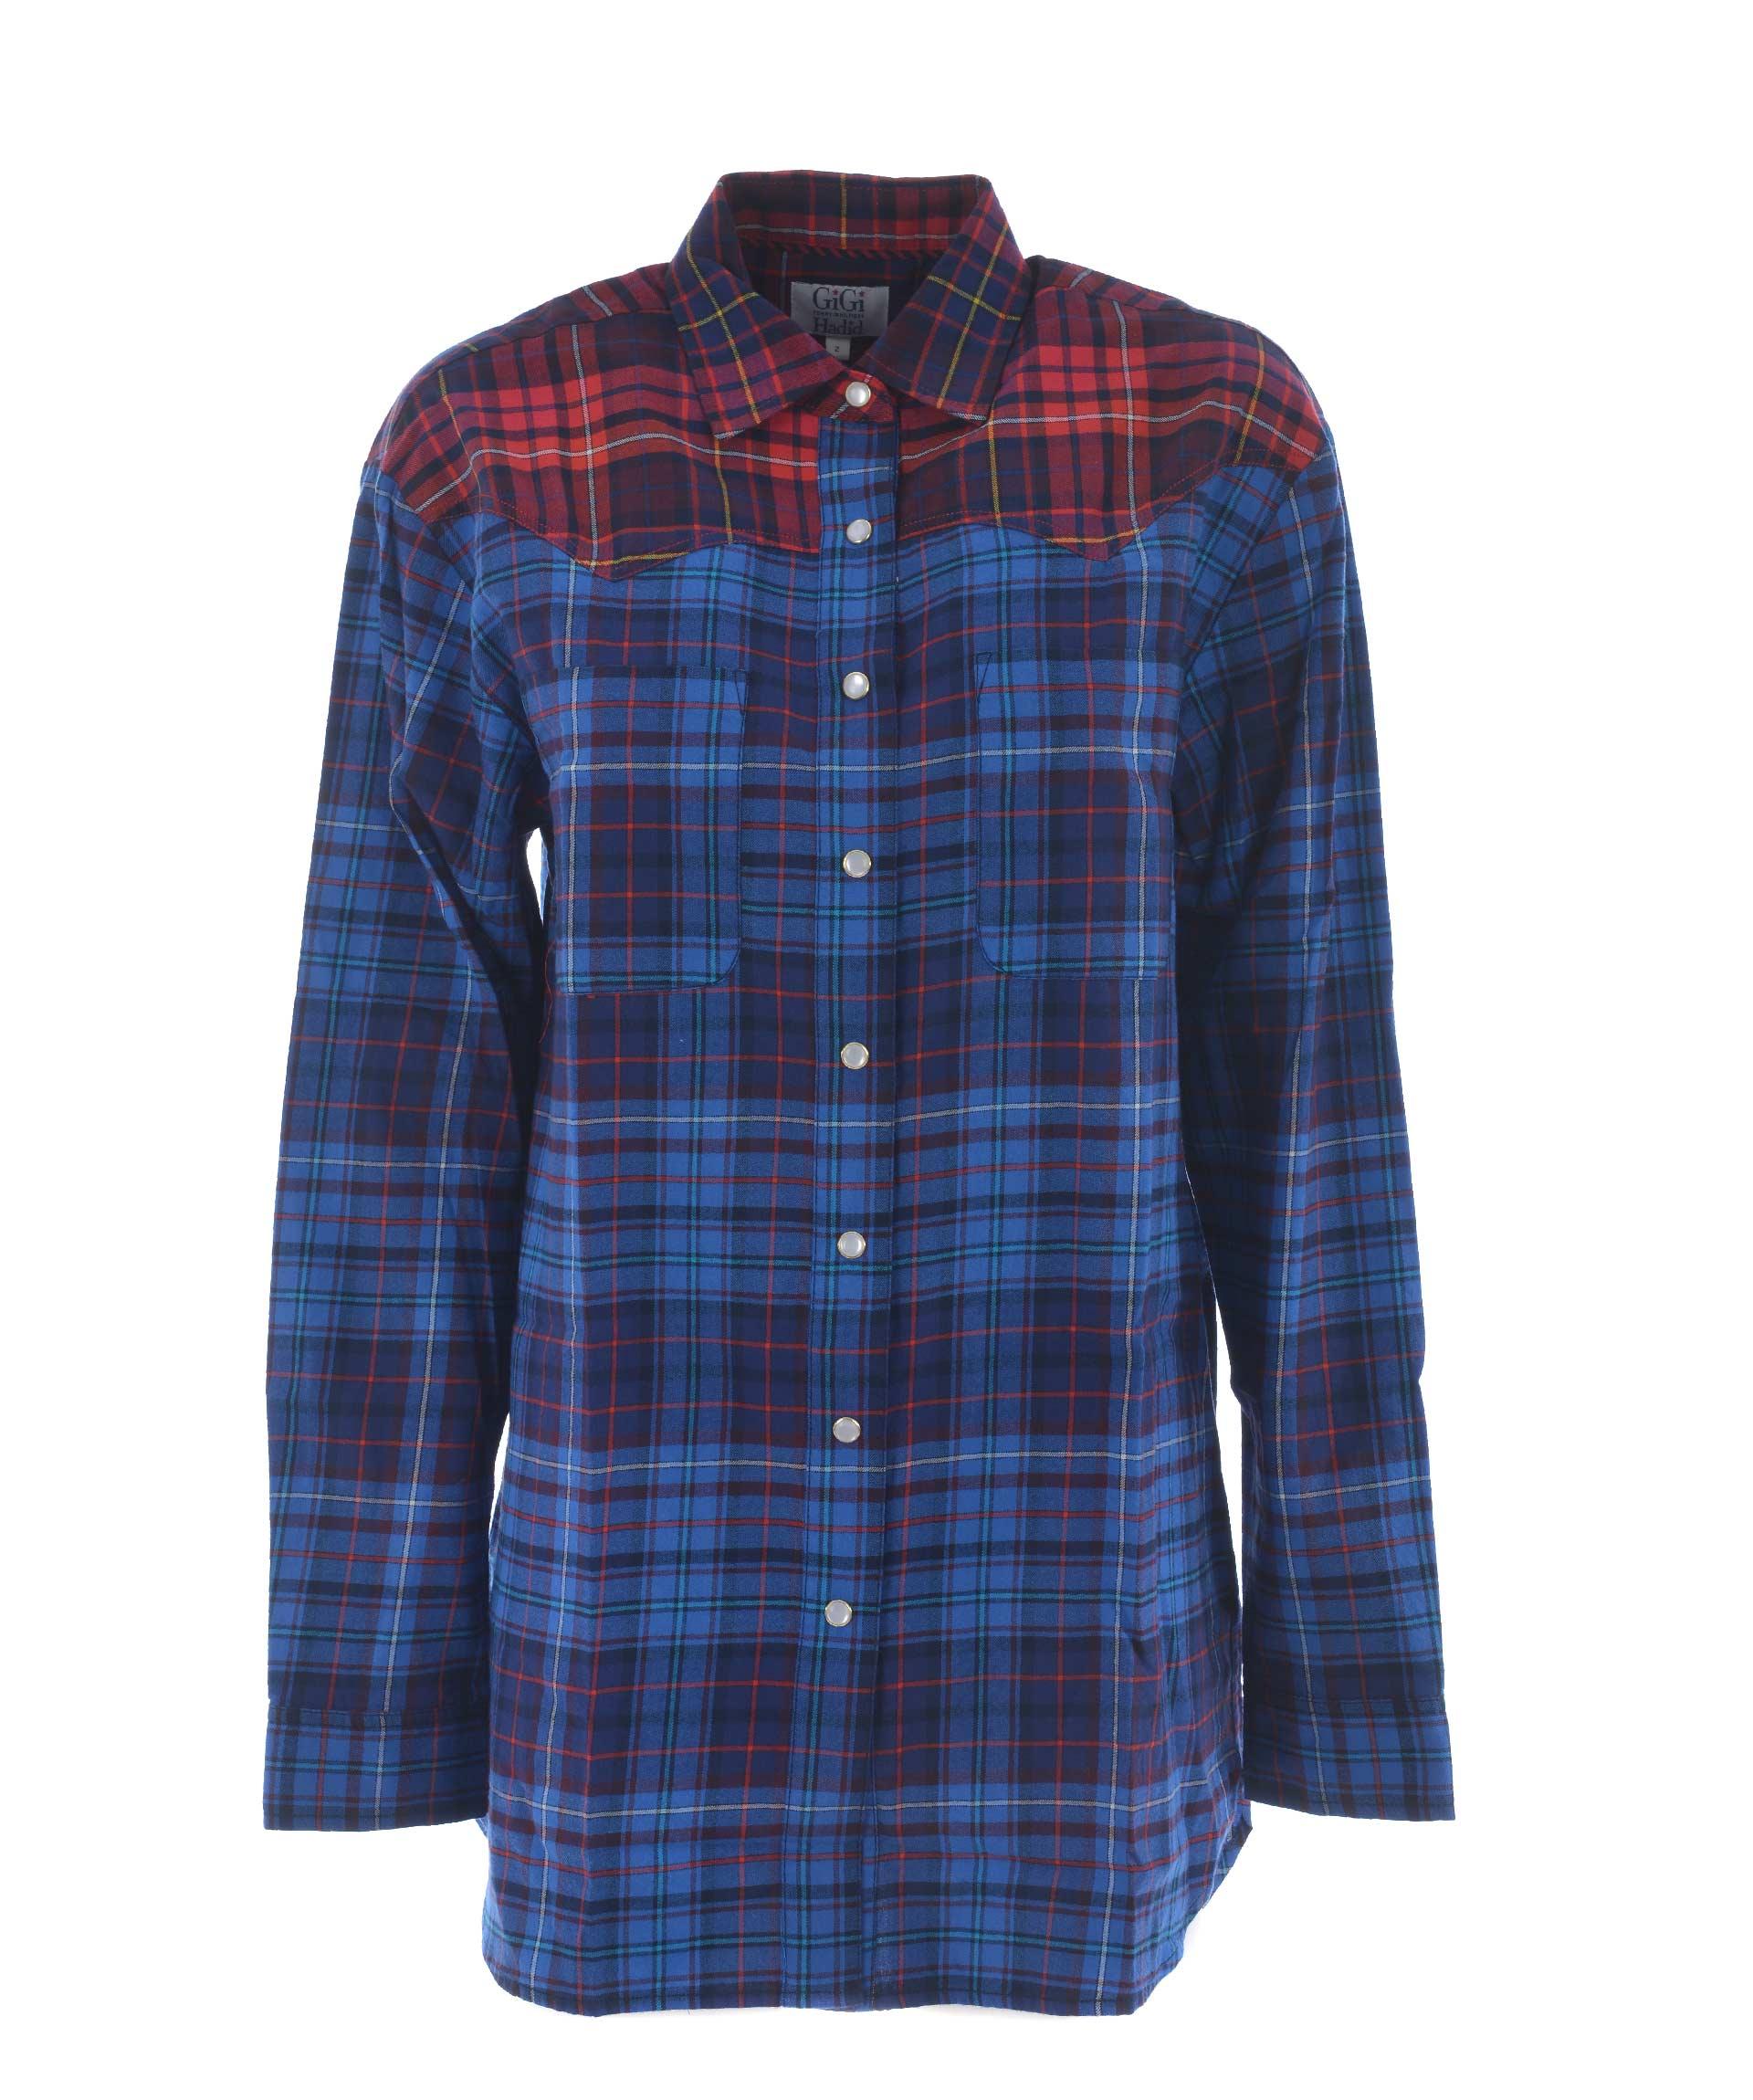 Tommy X Gigi Hadid Checked Shirt